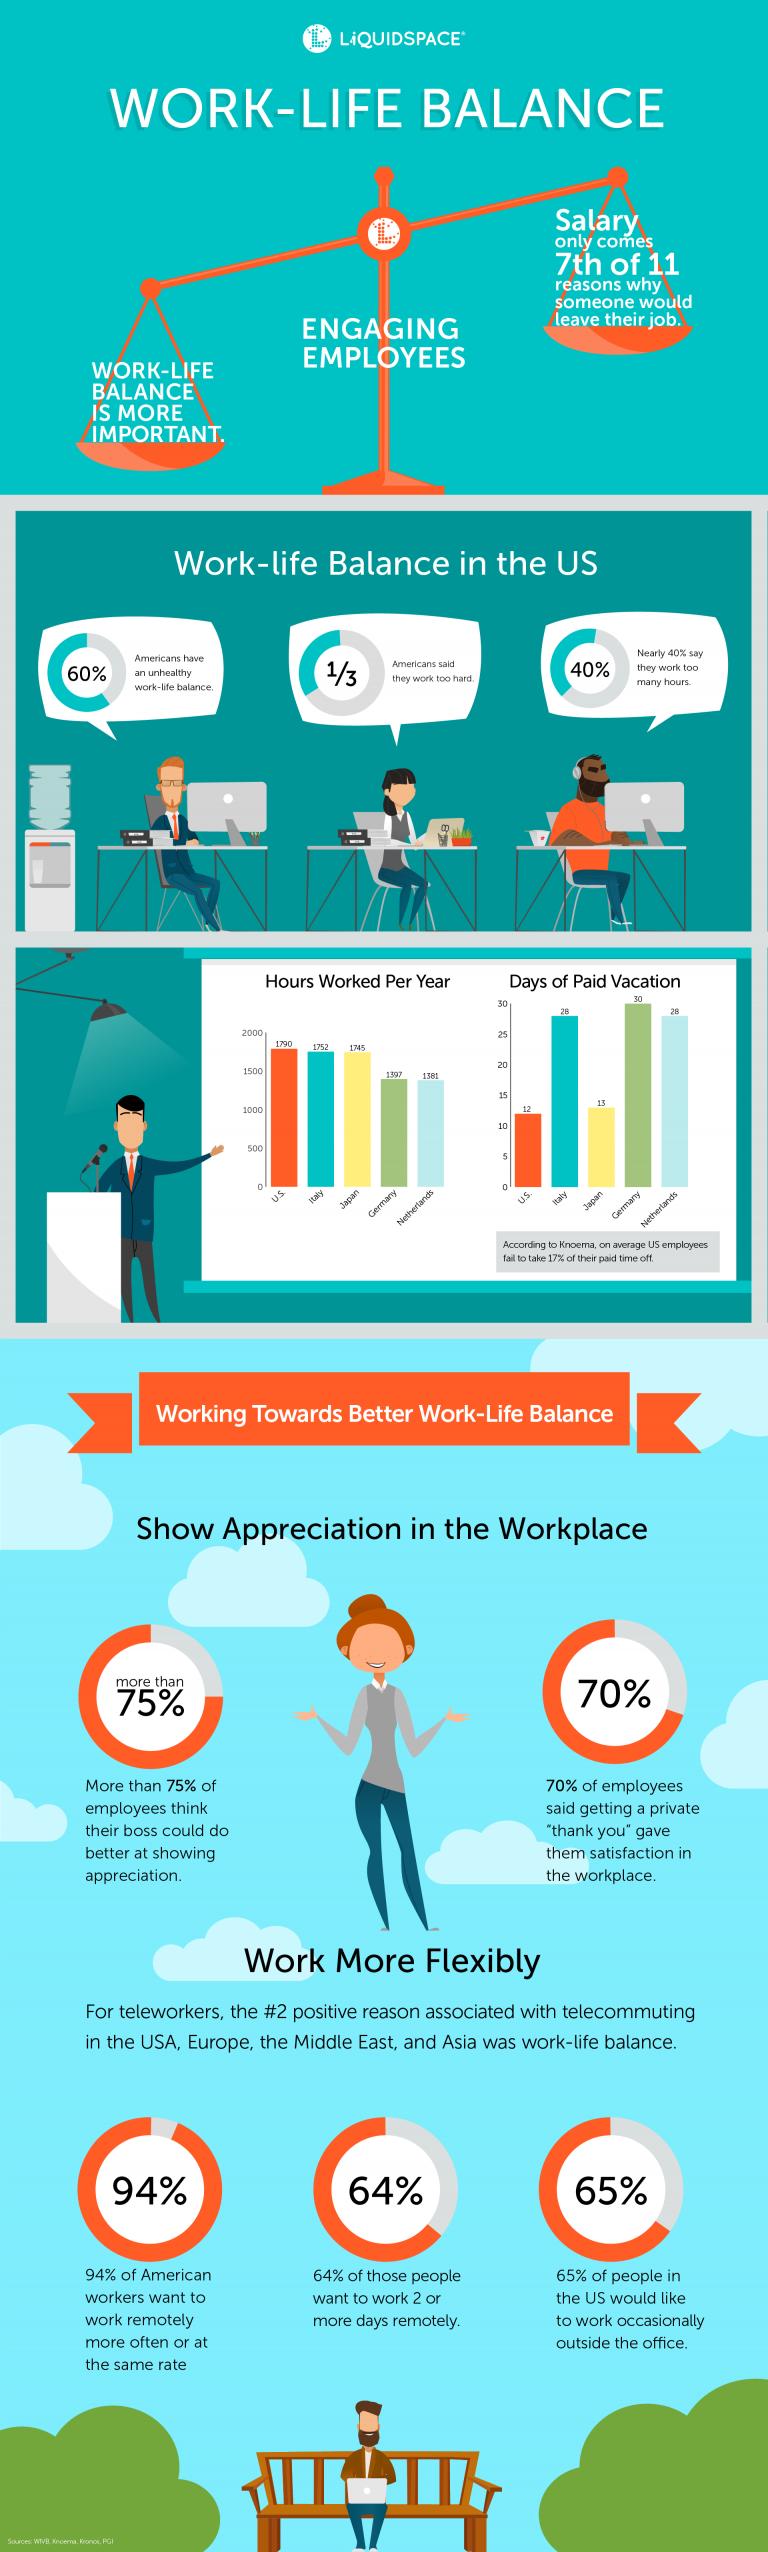 work-life-balance infographic